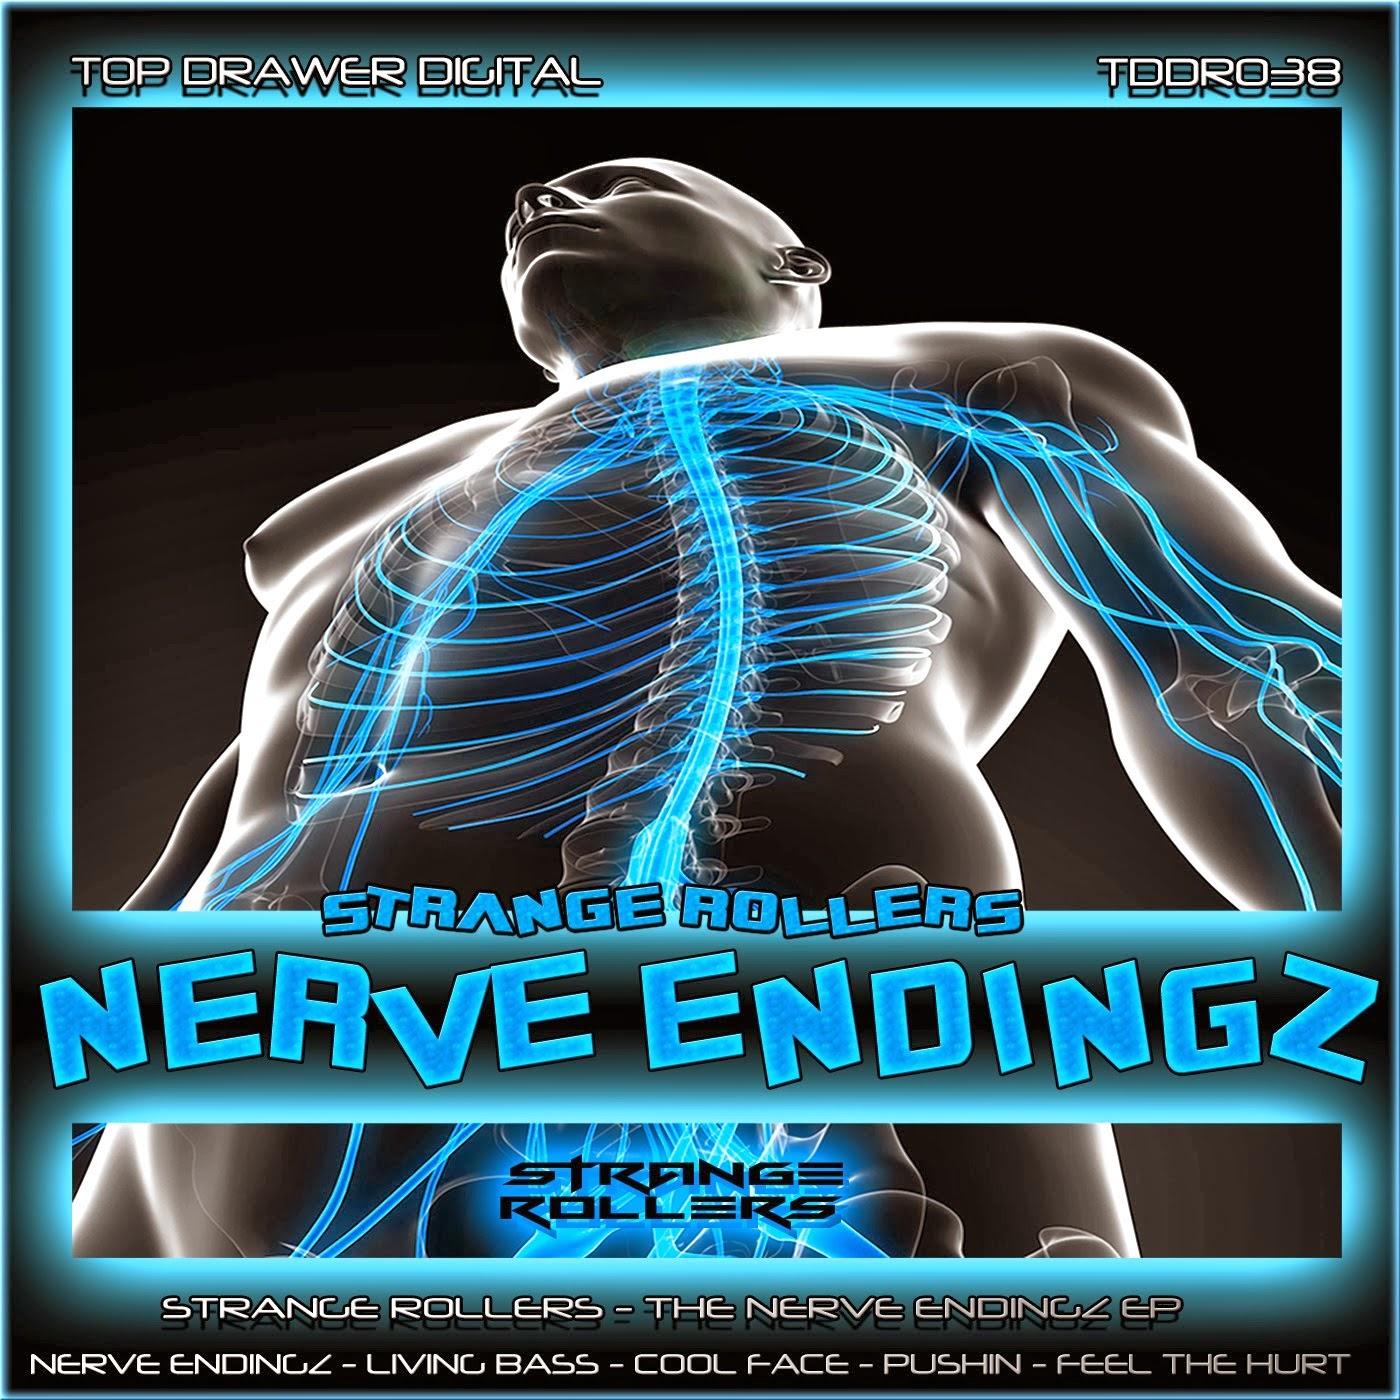 Strange Rollers - The Nerve EndingZ EP